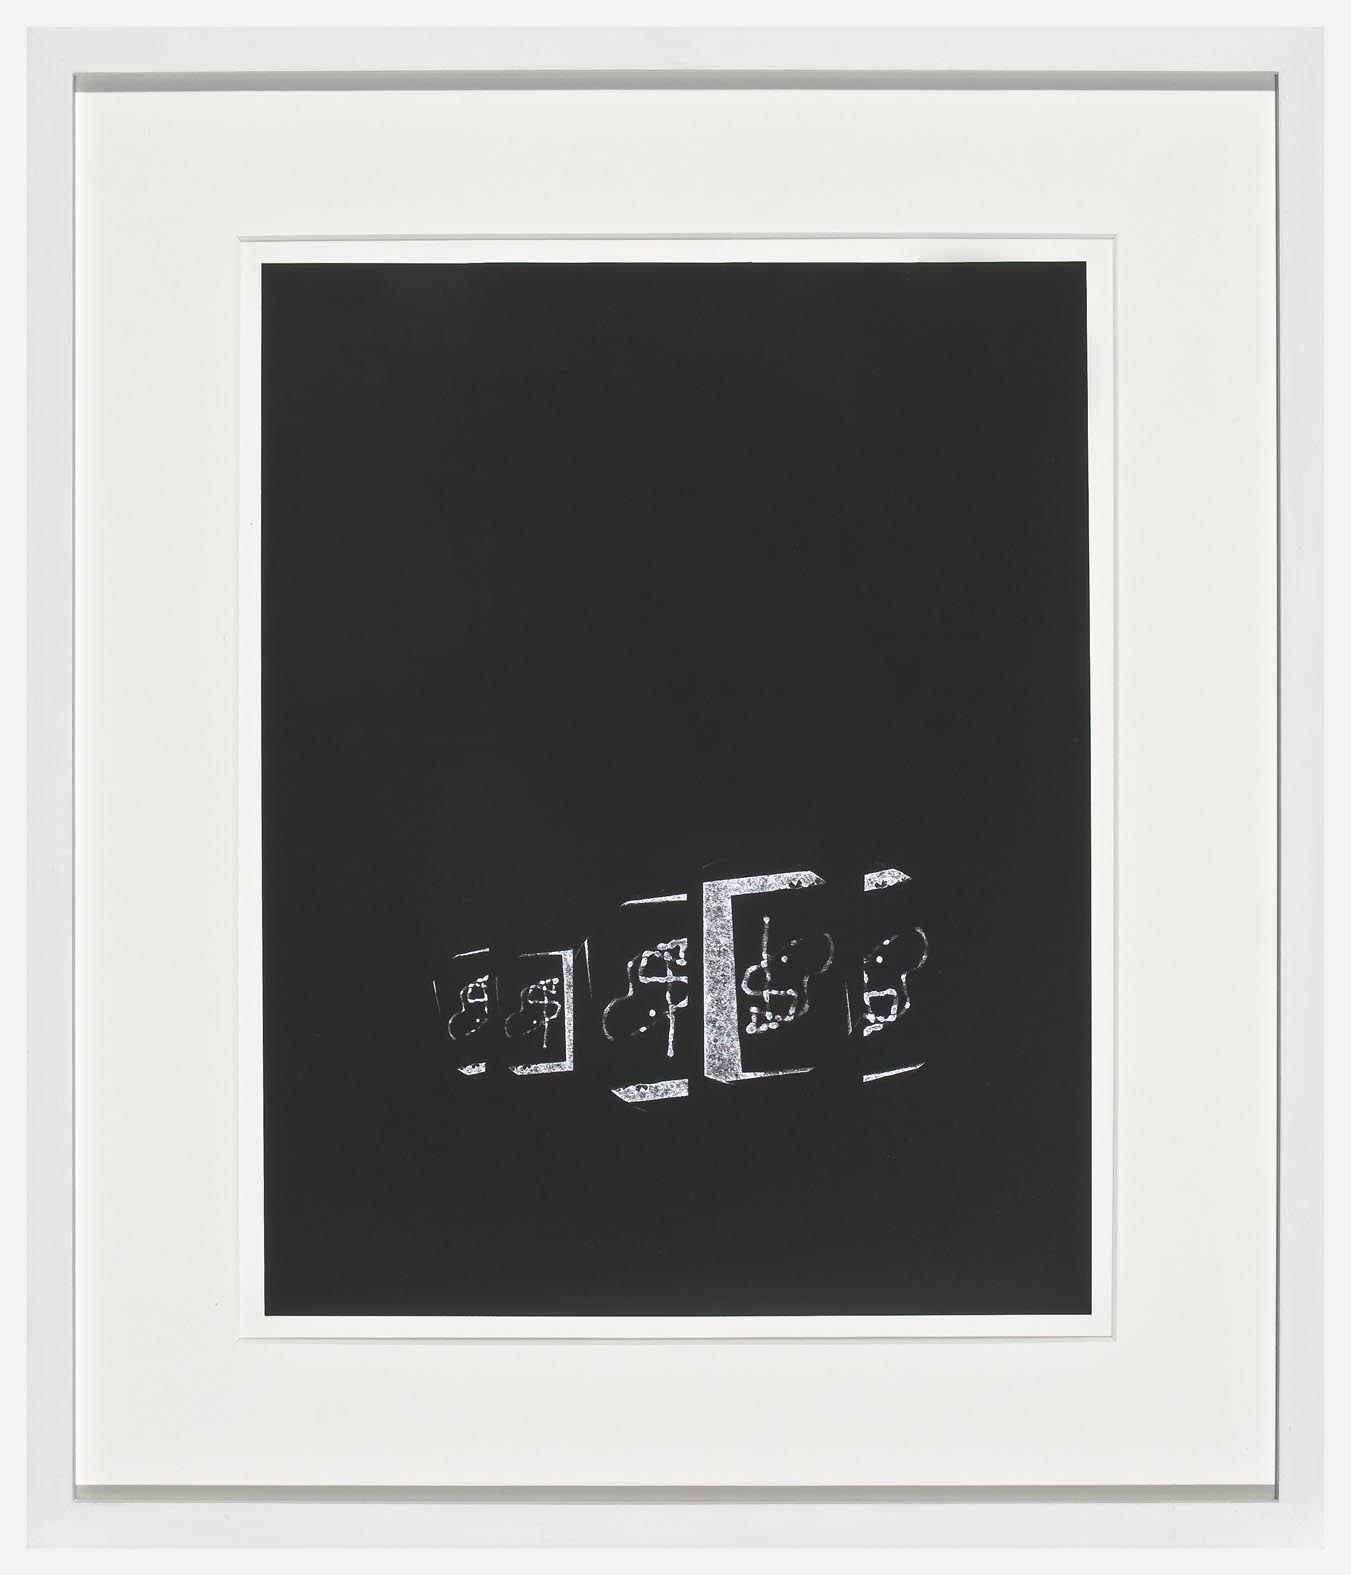 Josh Brand Untitled 2007 unique silver gelatin print 35.5 x 27.9 cm